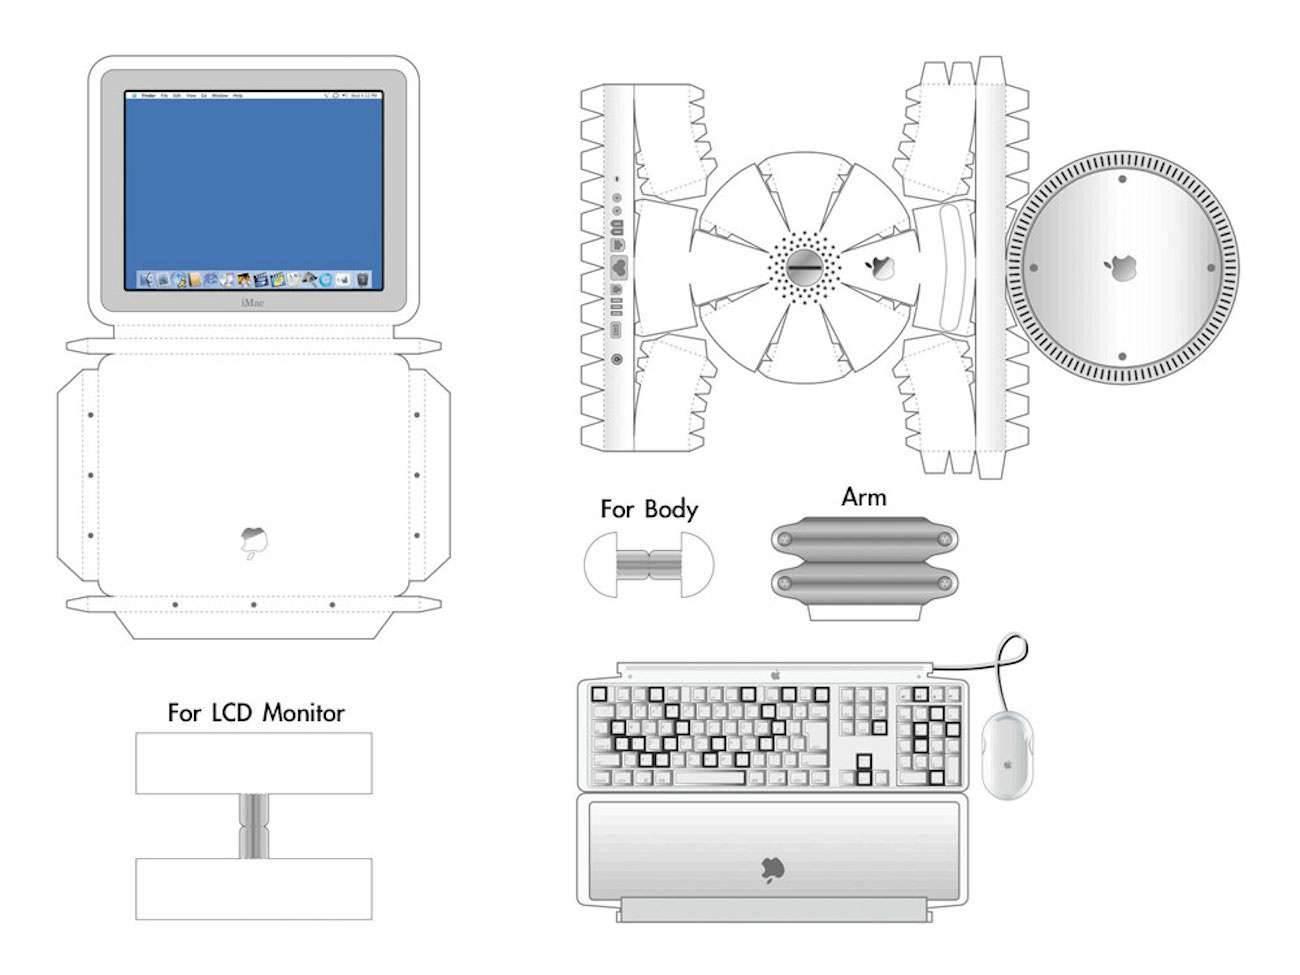 iMacG4 (1)